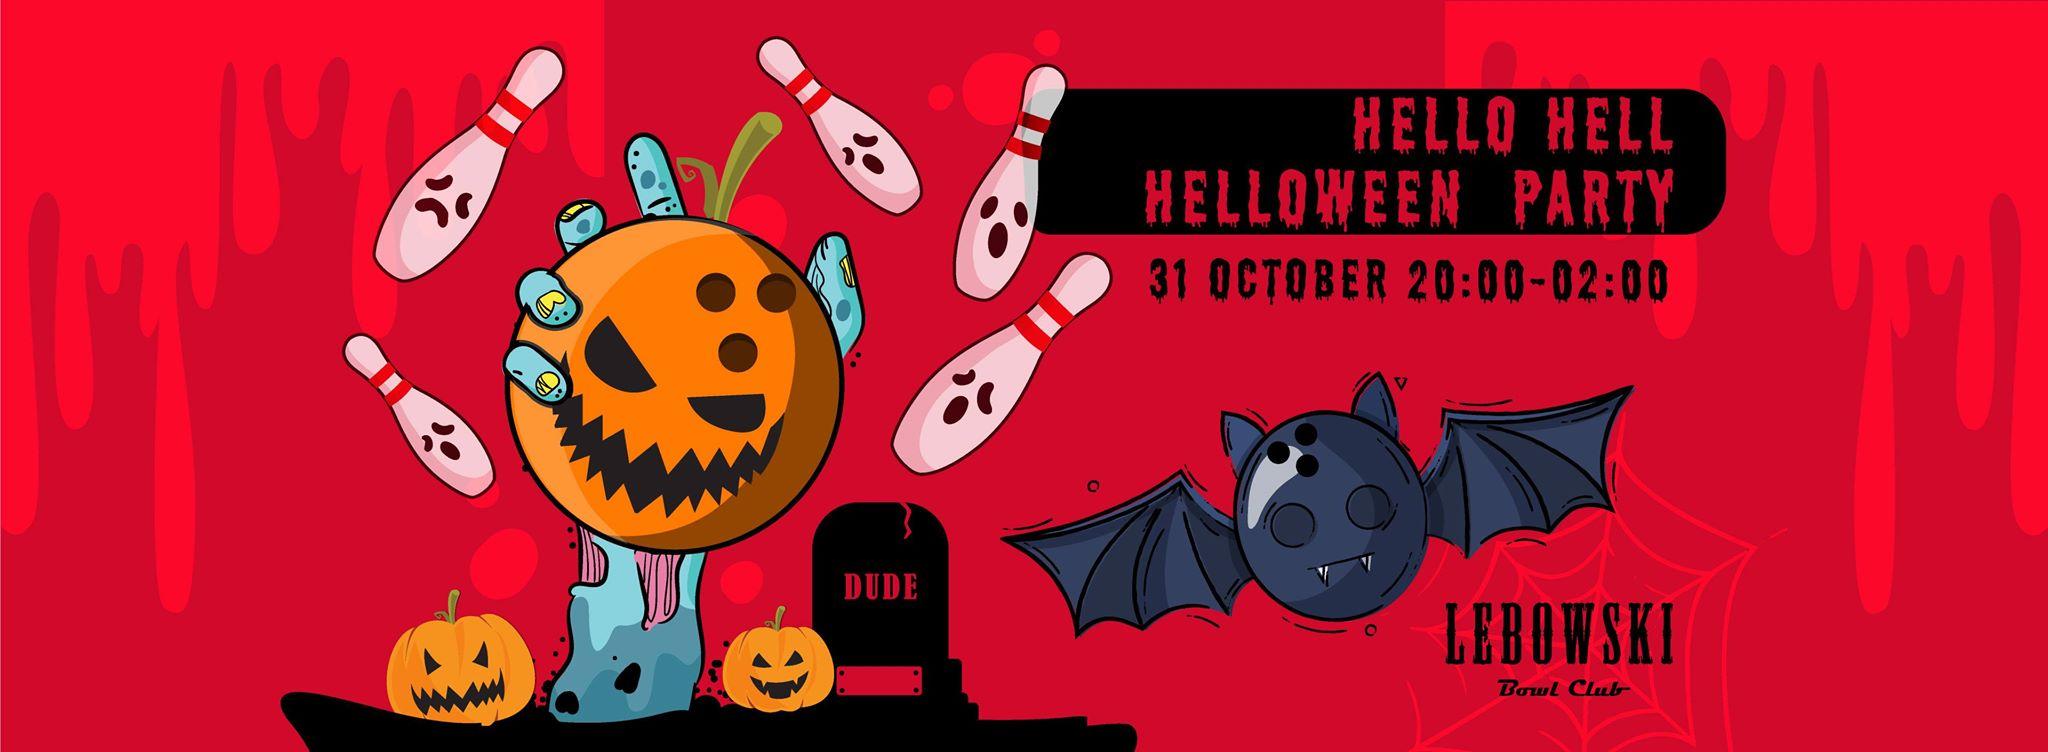 Hello Hell Halloween Party at Lebowski photo